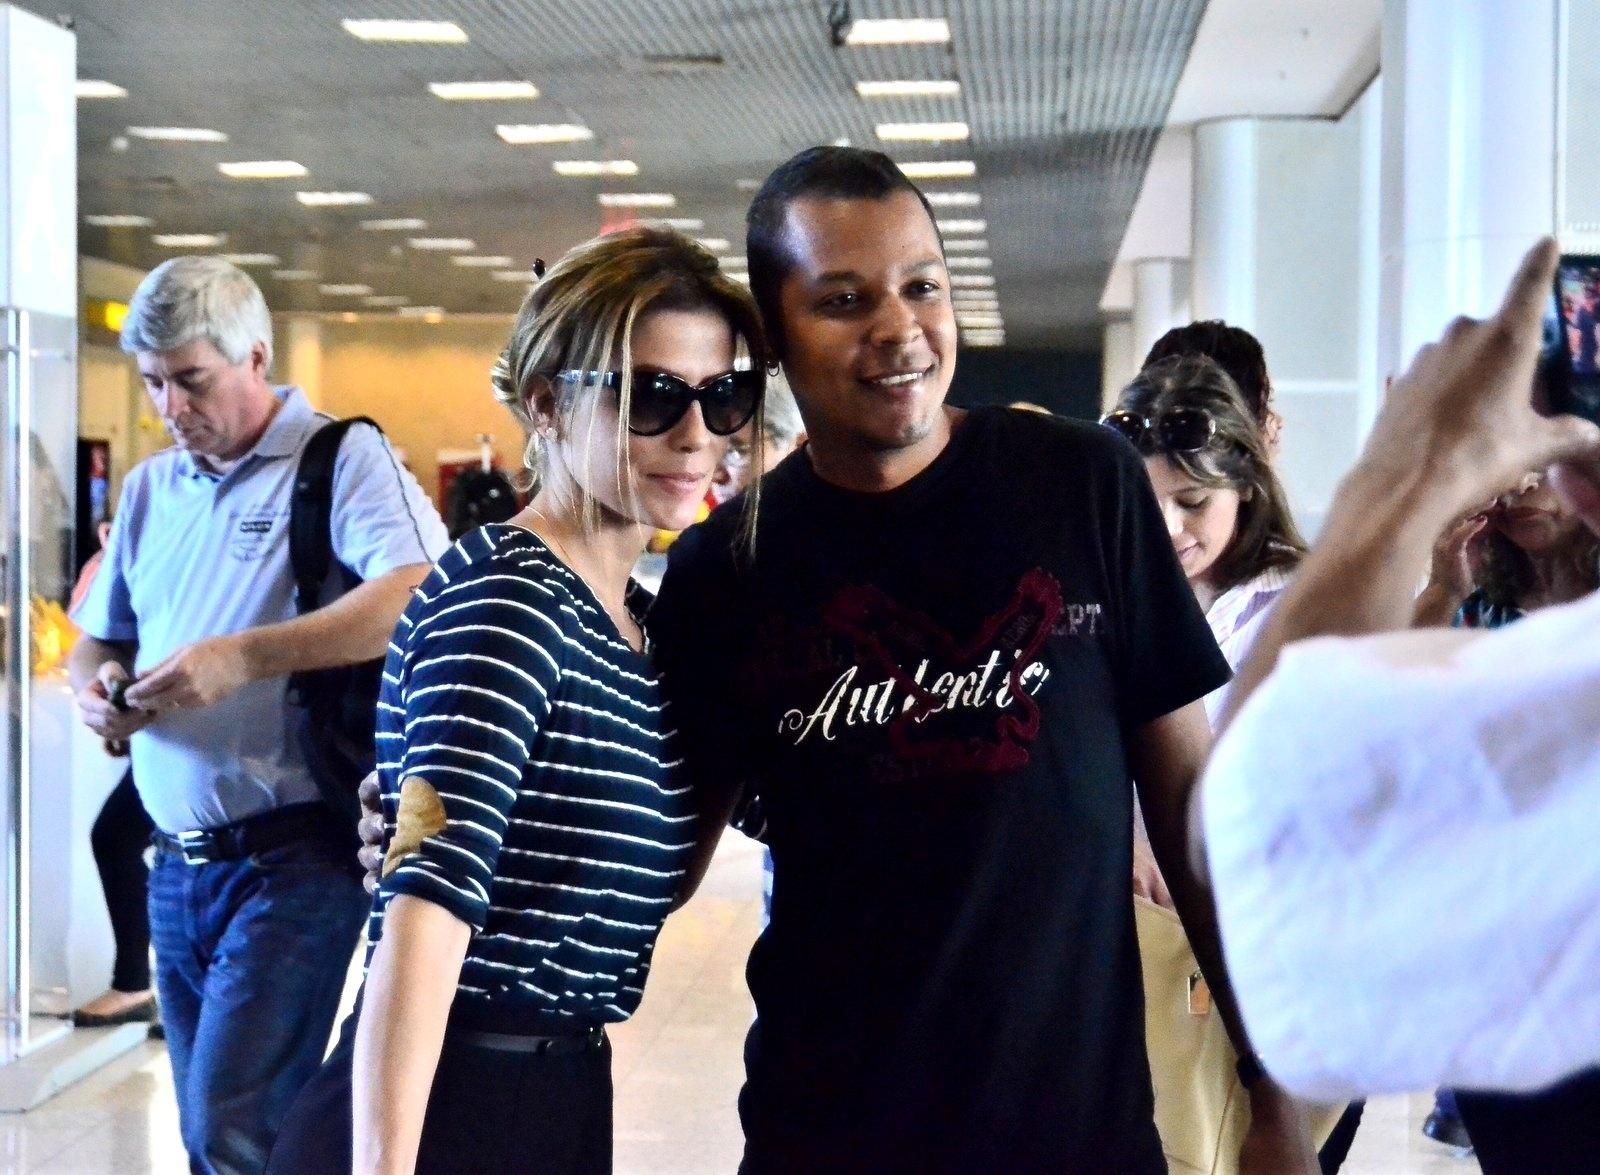 15.mai.2014 - Loira, a atriz Deborah Secco posou para fotos com fãs no aeroporto Santos Dumont antes de embarcar nesta quinta-feira